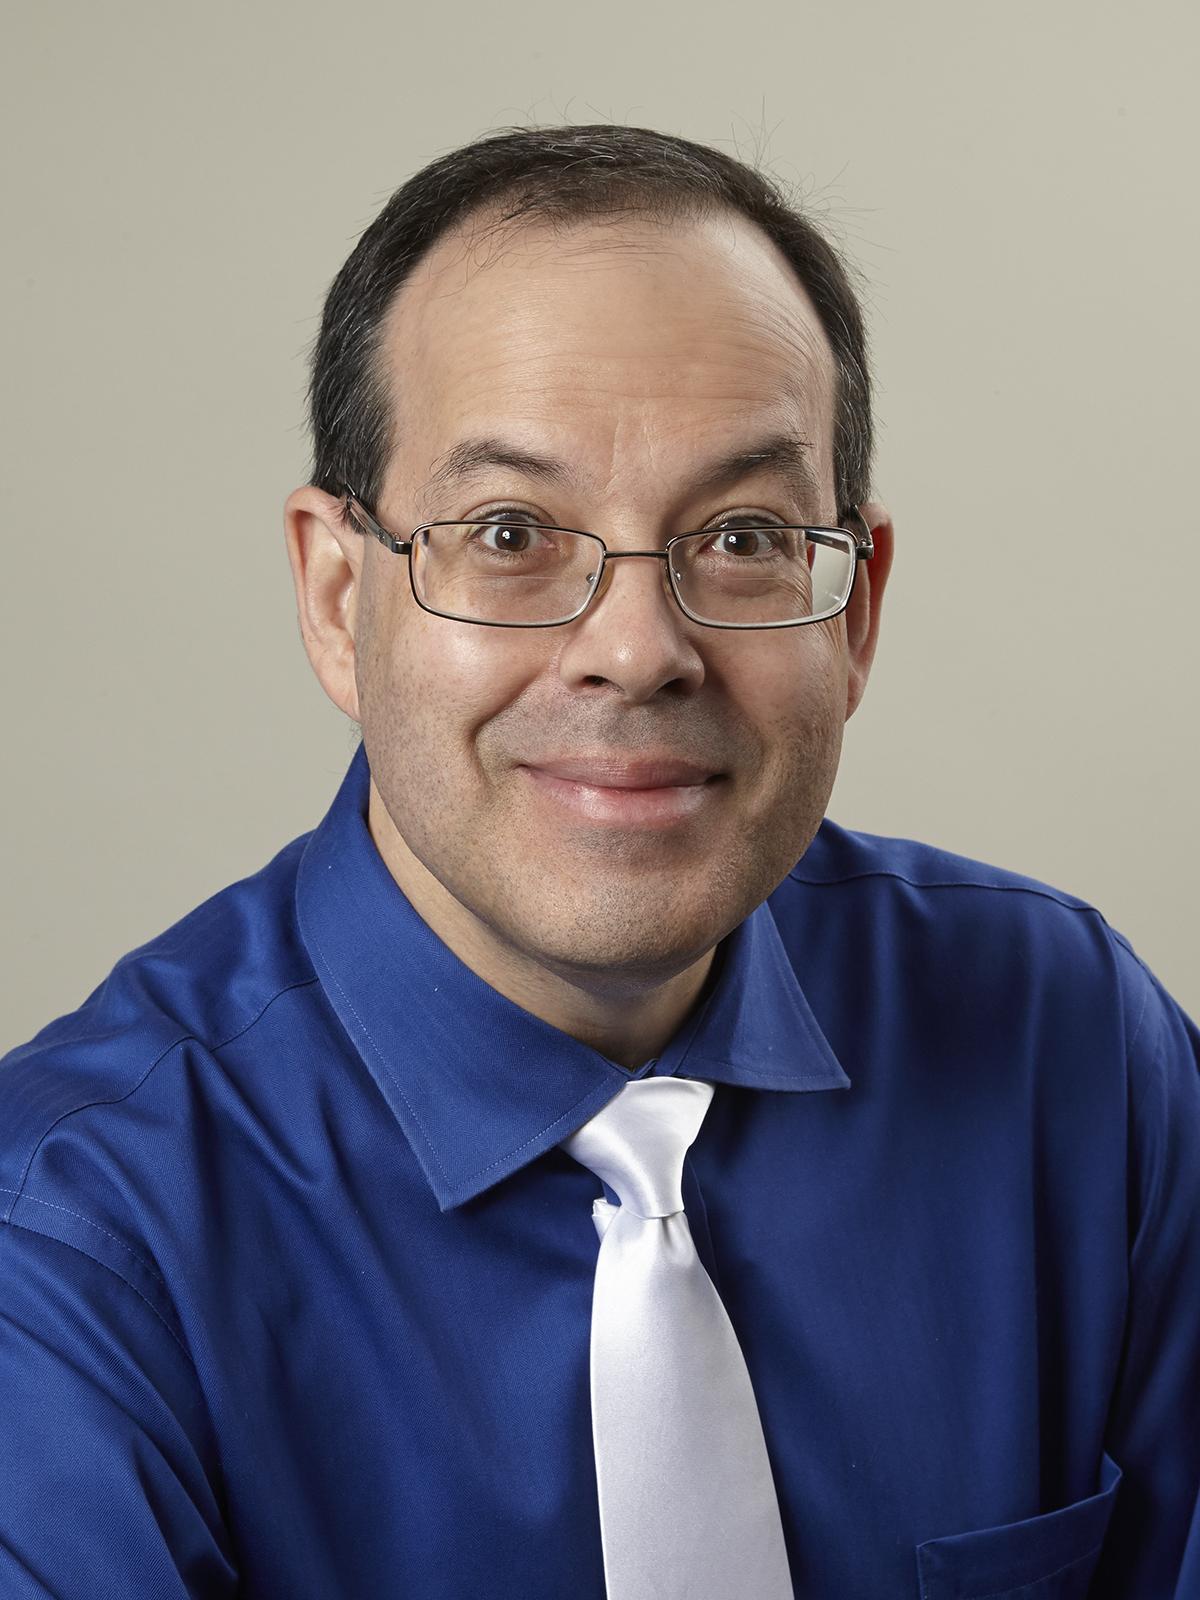 david suhrbier do david suhrbier do gender male specialty specializes in neurology pediatric